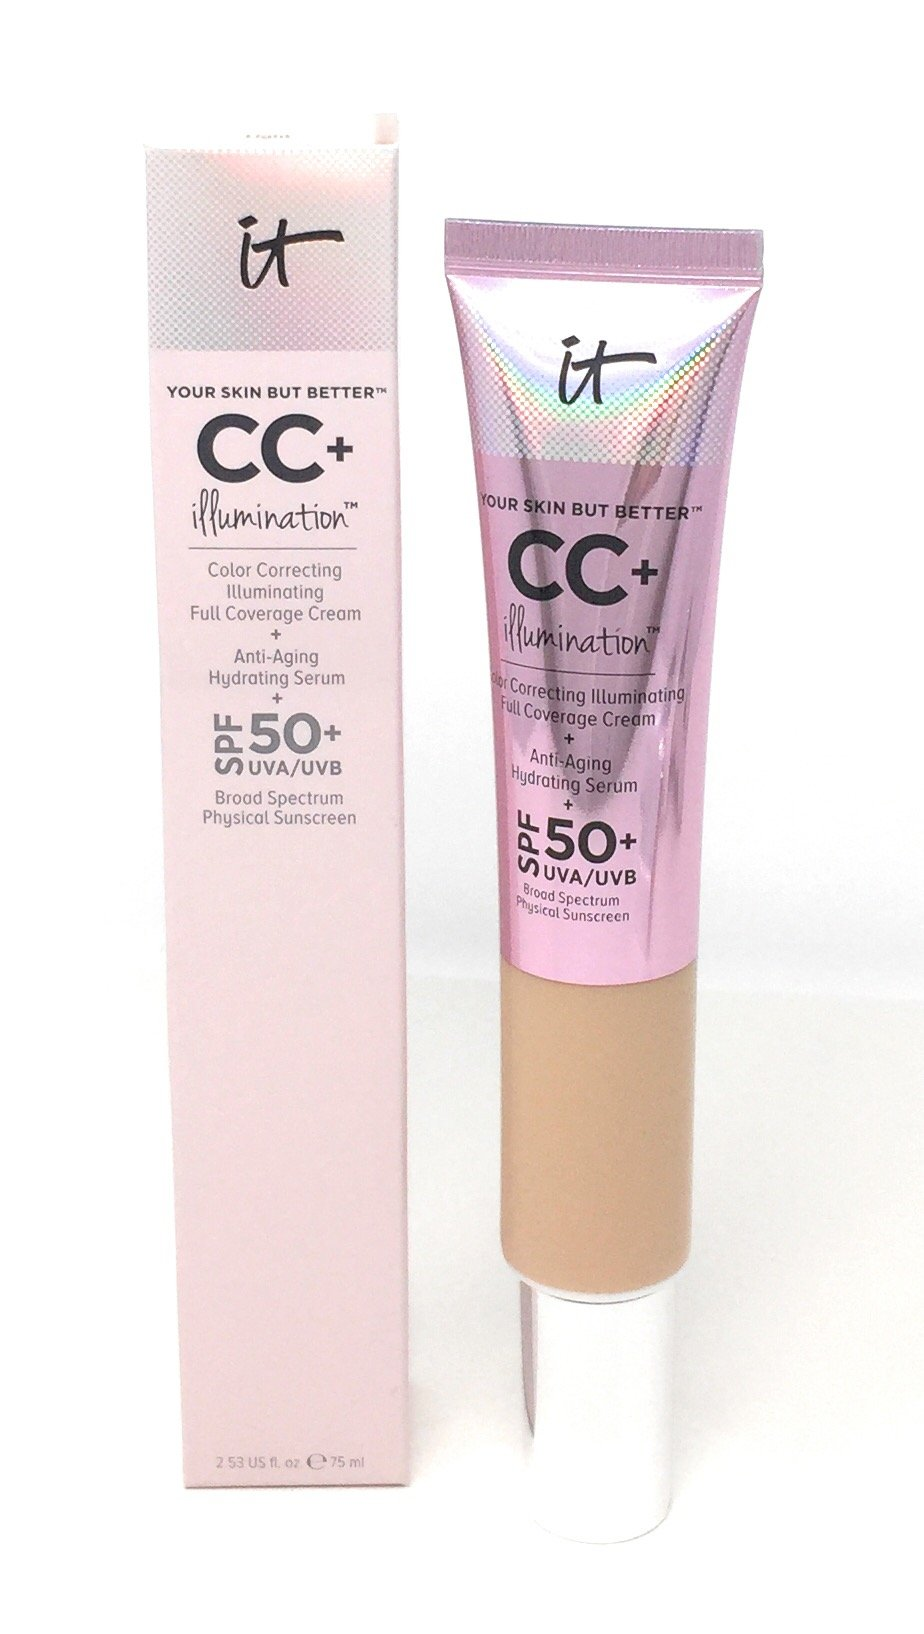 amazon com   it cosmetics your skin but better cc  cream spf 50  2 53 fl oz medium   beauty